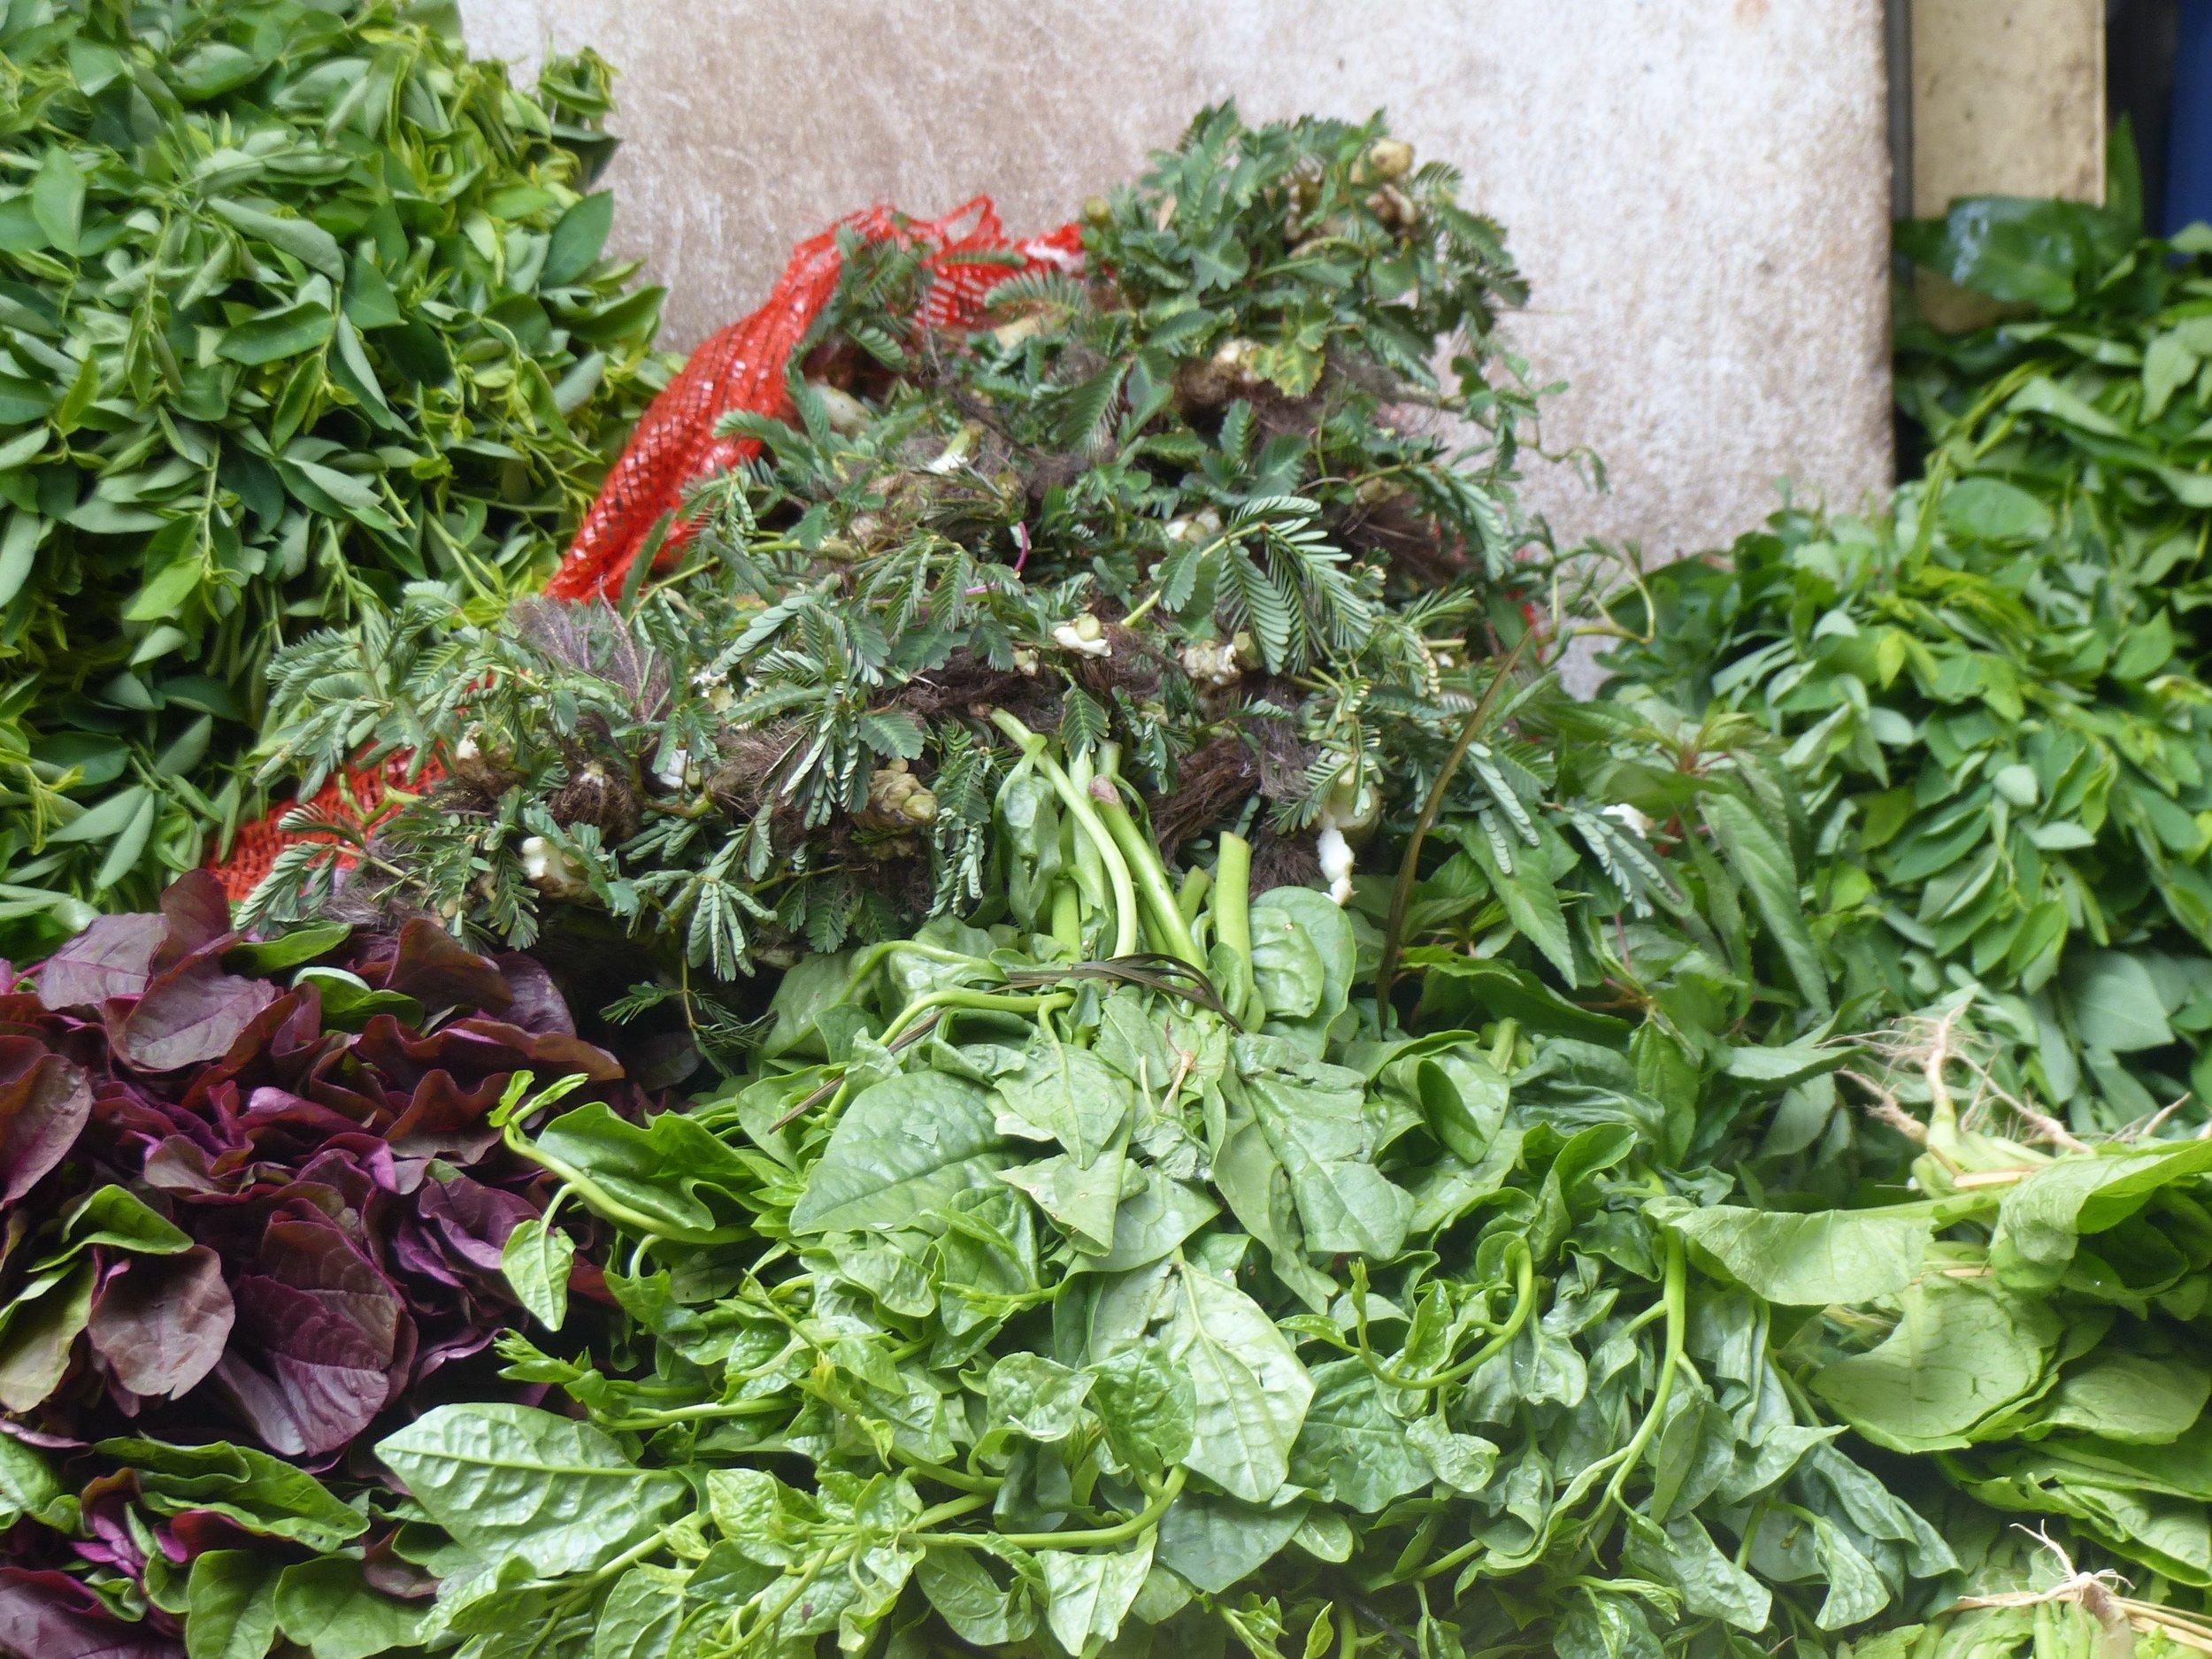 I've never seen so many herbs/greens